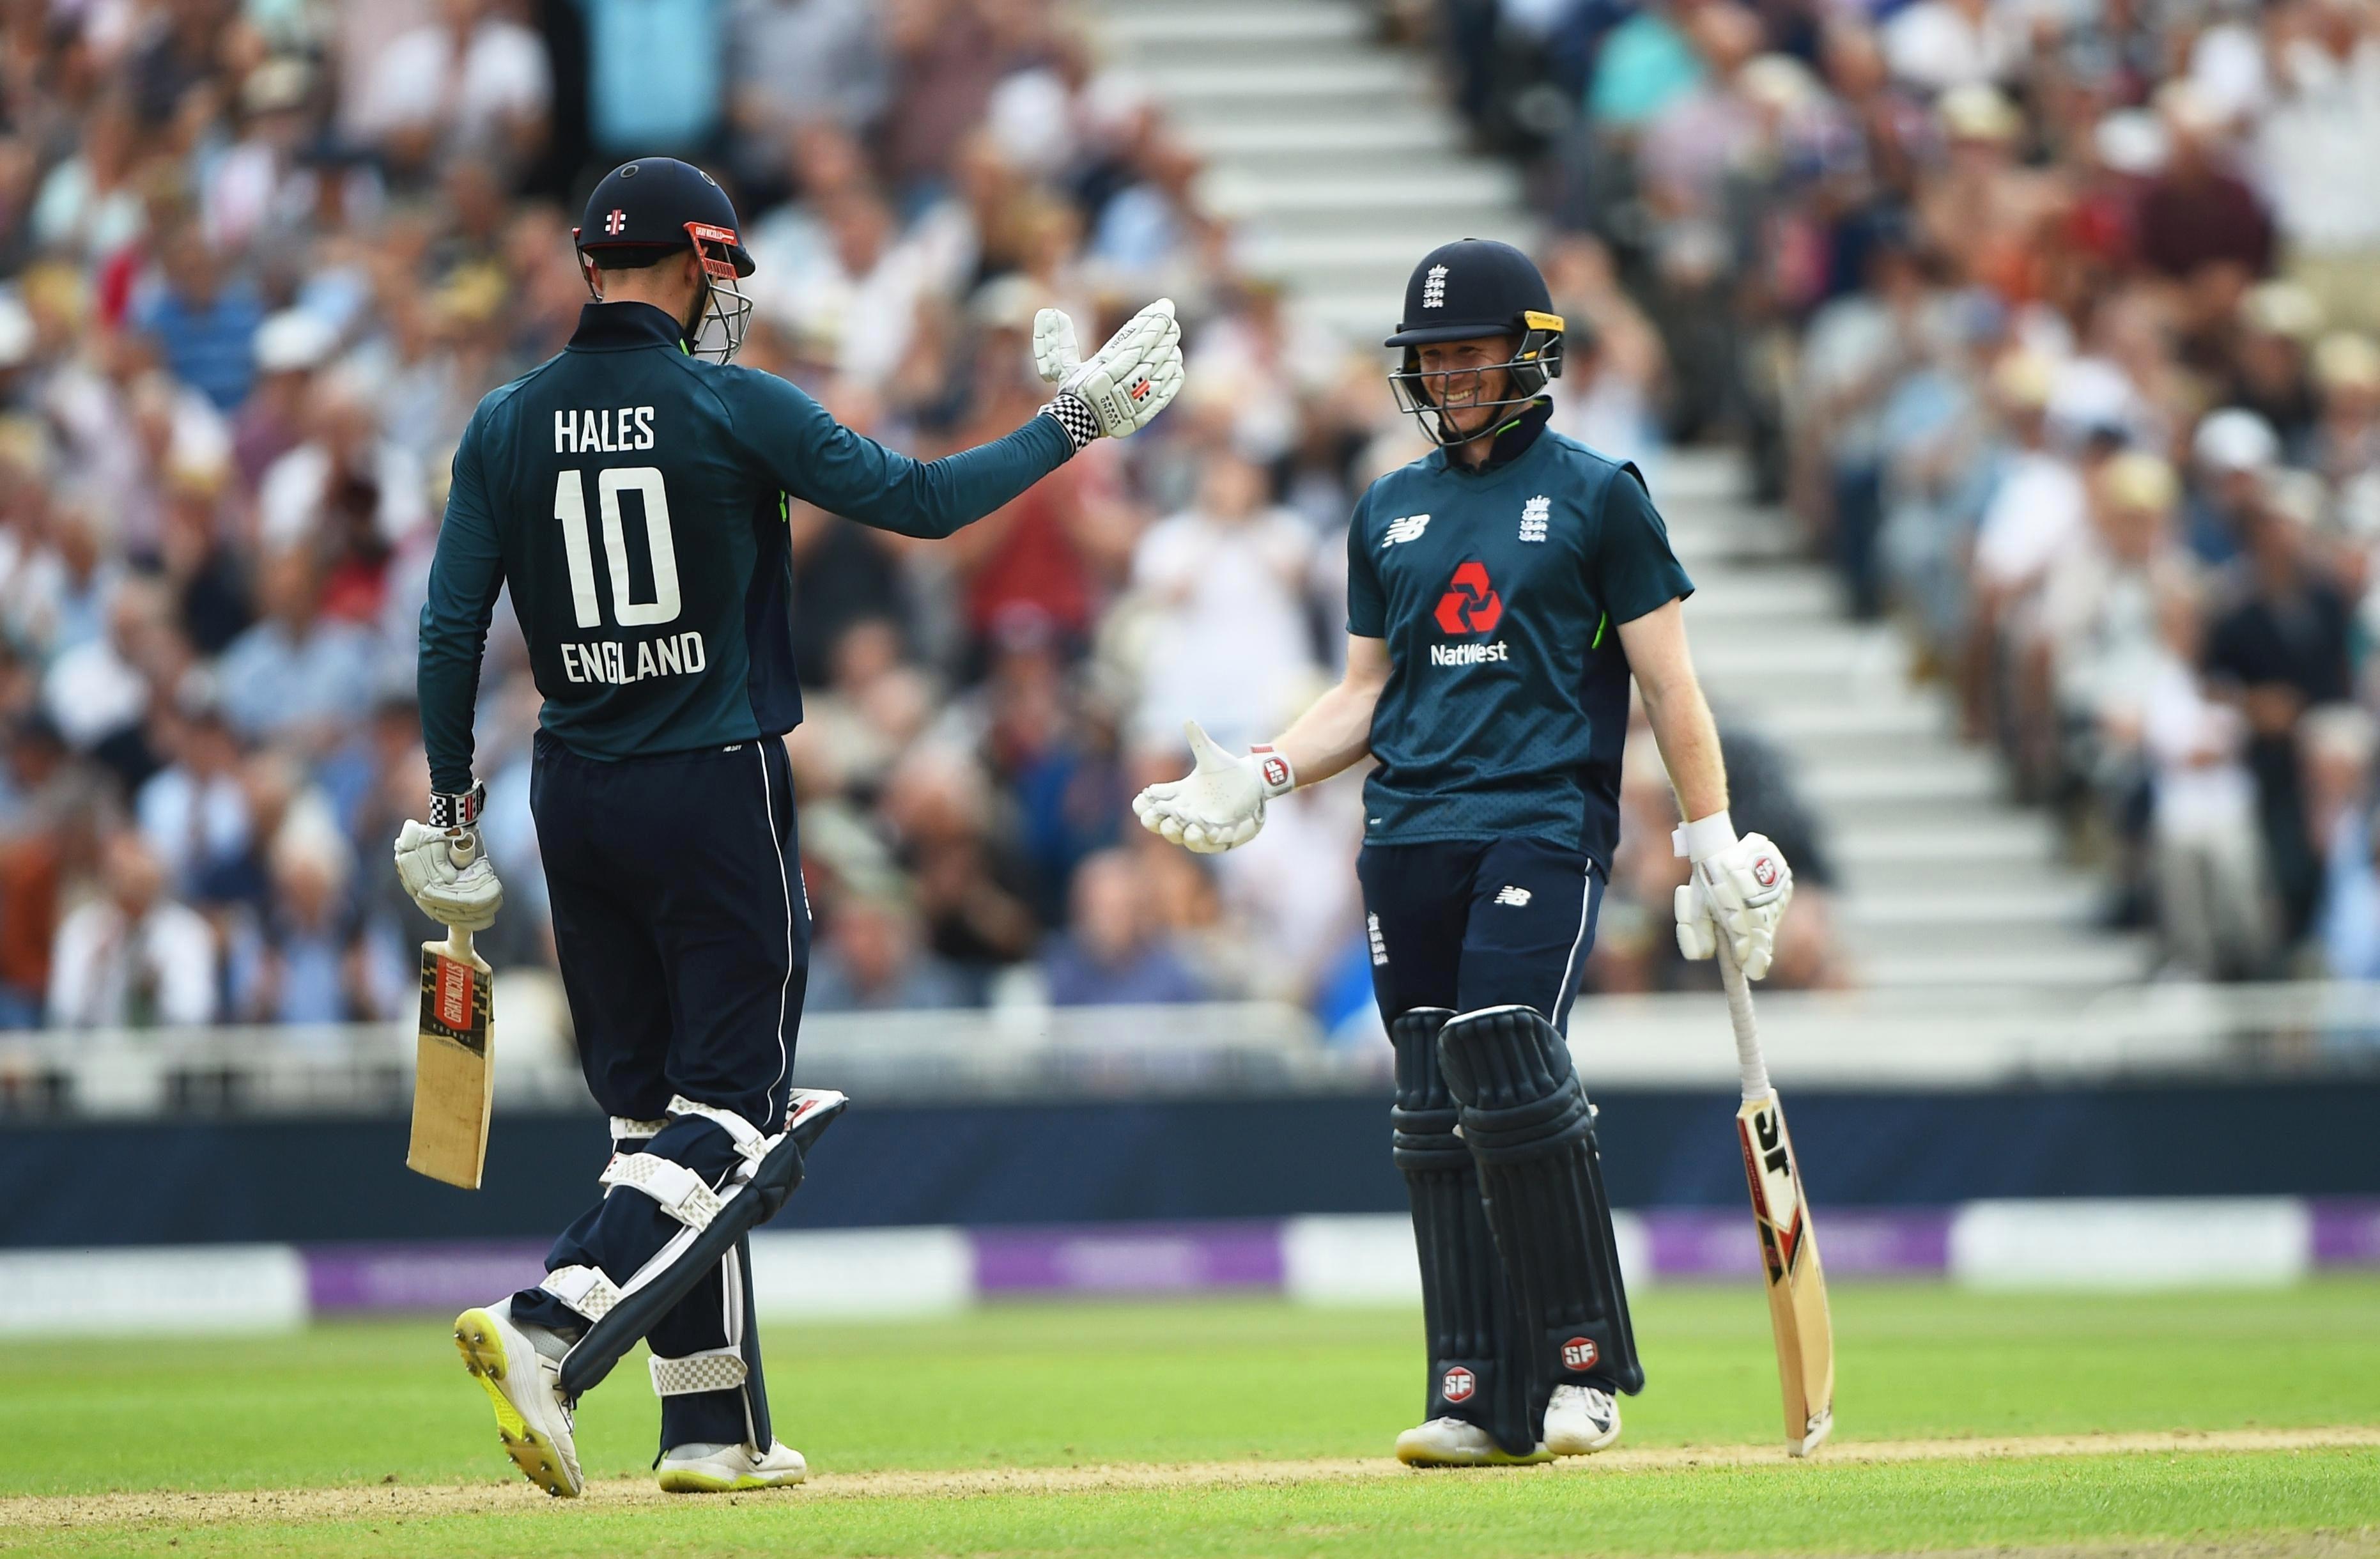 Alex Hales reckons England could surpass 500 runs in a ODI soon